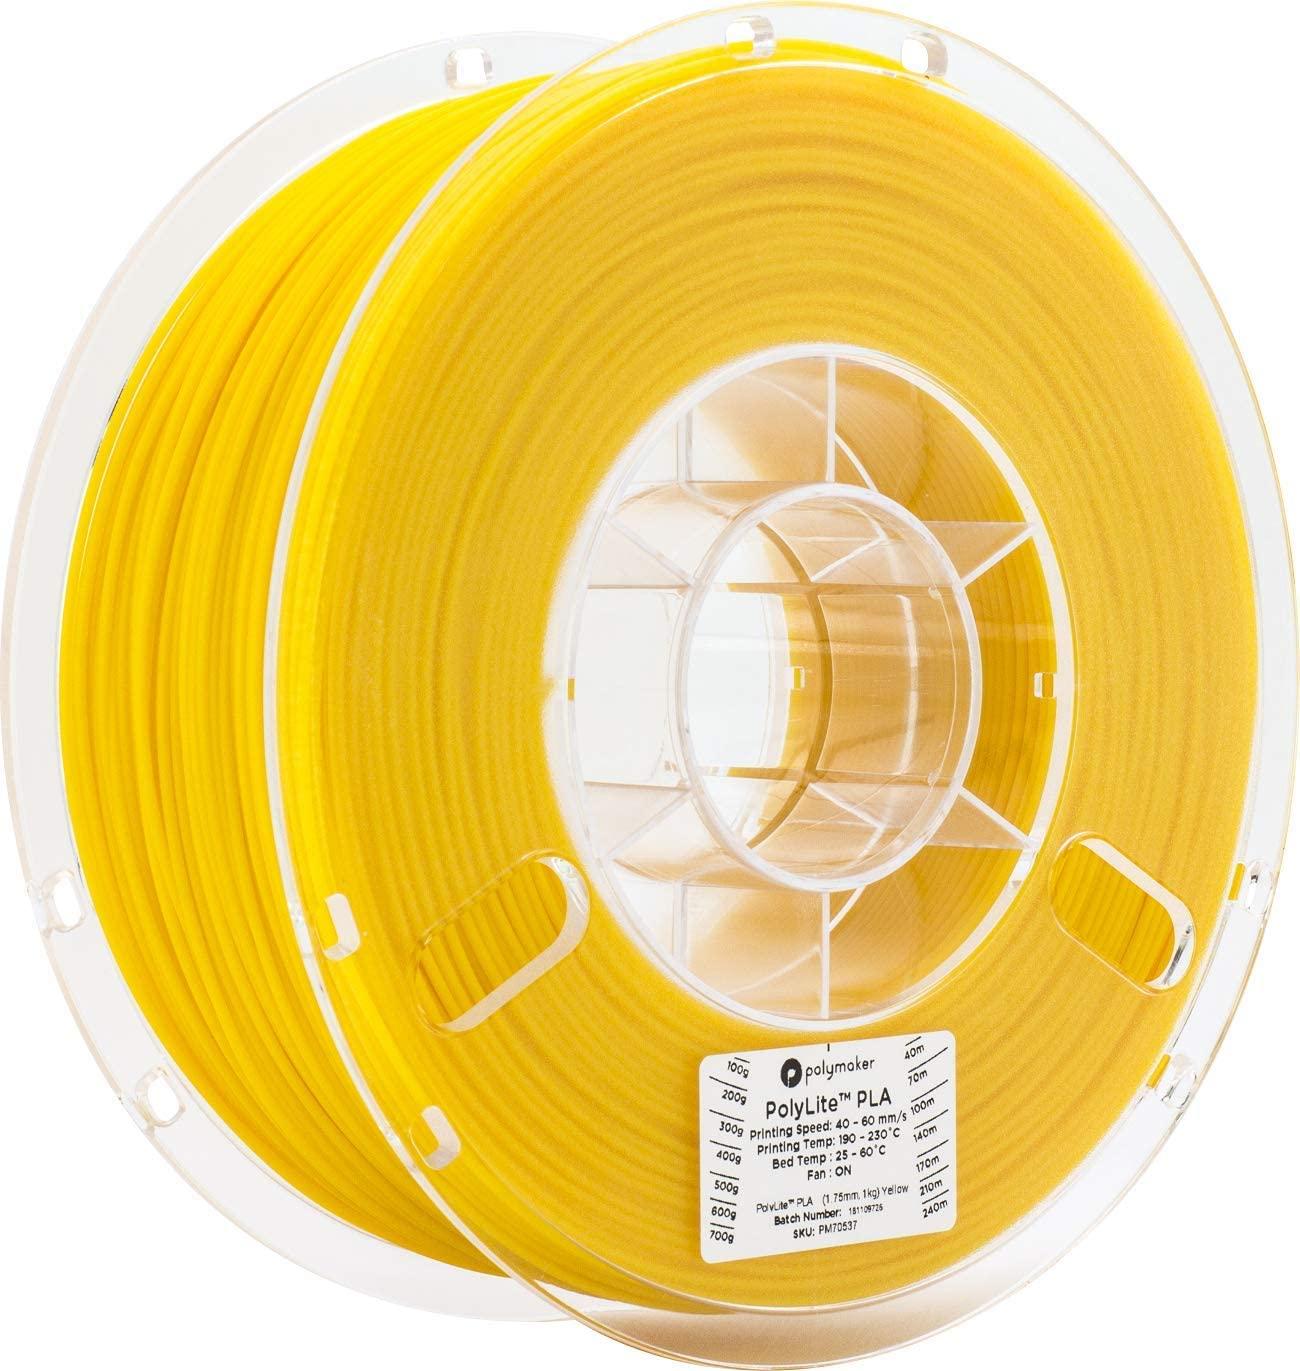 Polymaker PolyLite PLA 3D Printer Filament, 3D Printing Filament, 1.75mm pla - 1Kg Spool (2.2 lbs) Yellow, fit Most FDM Printer…